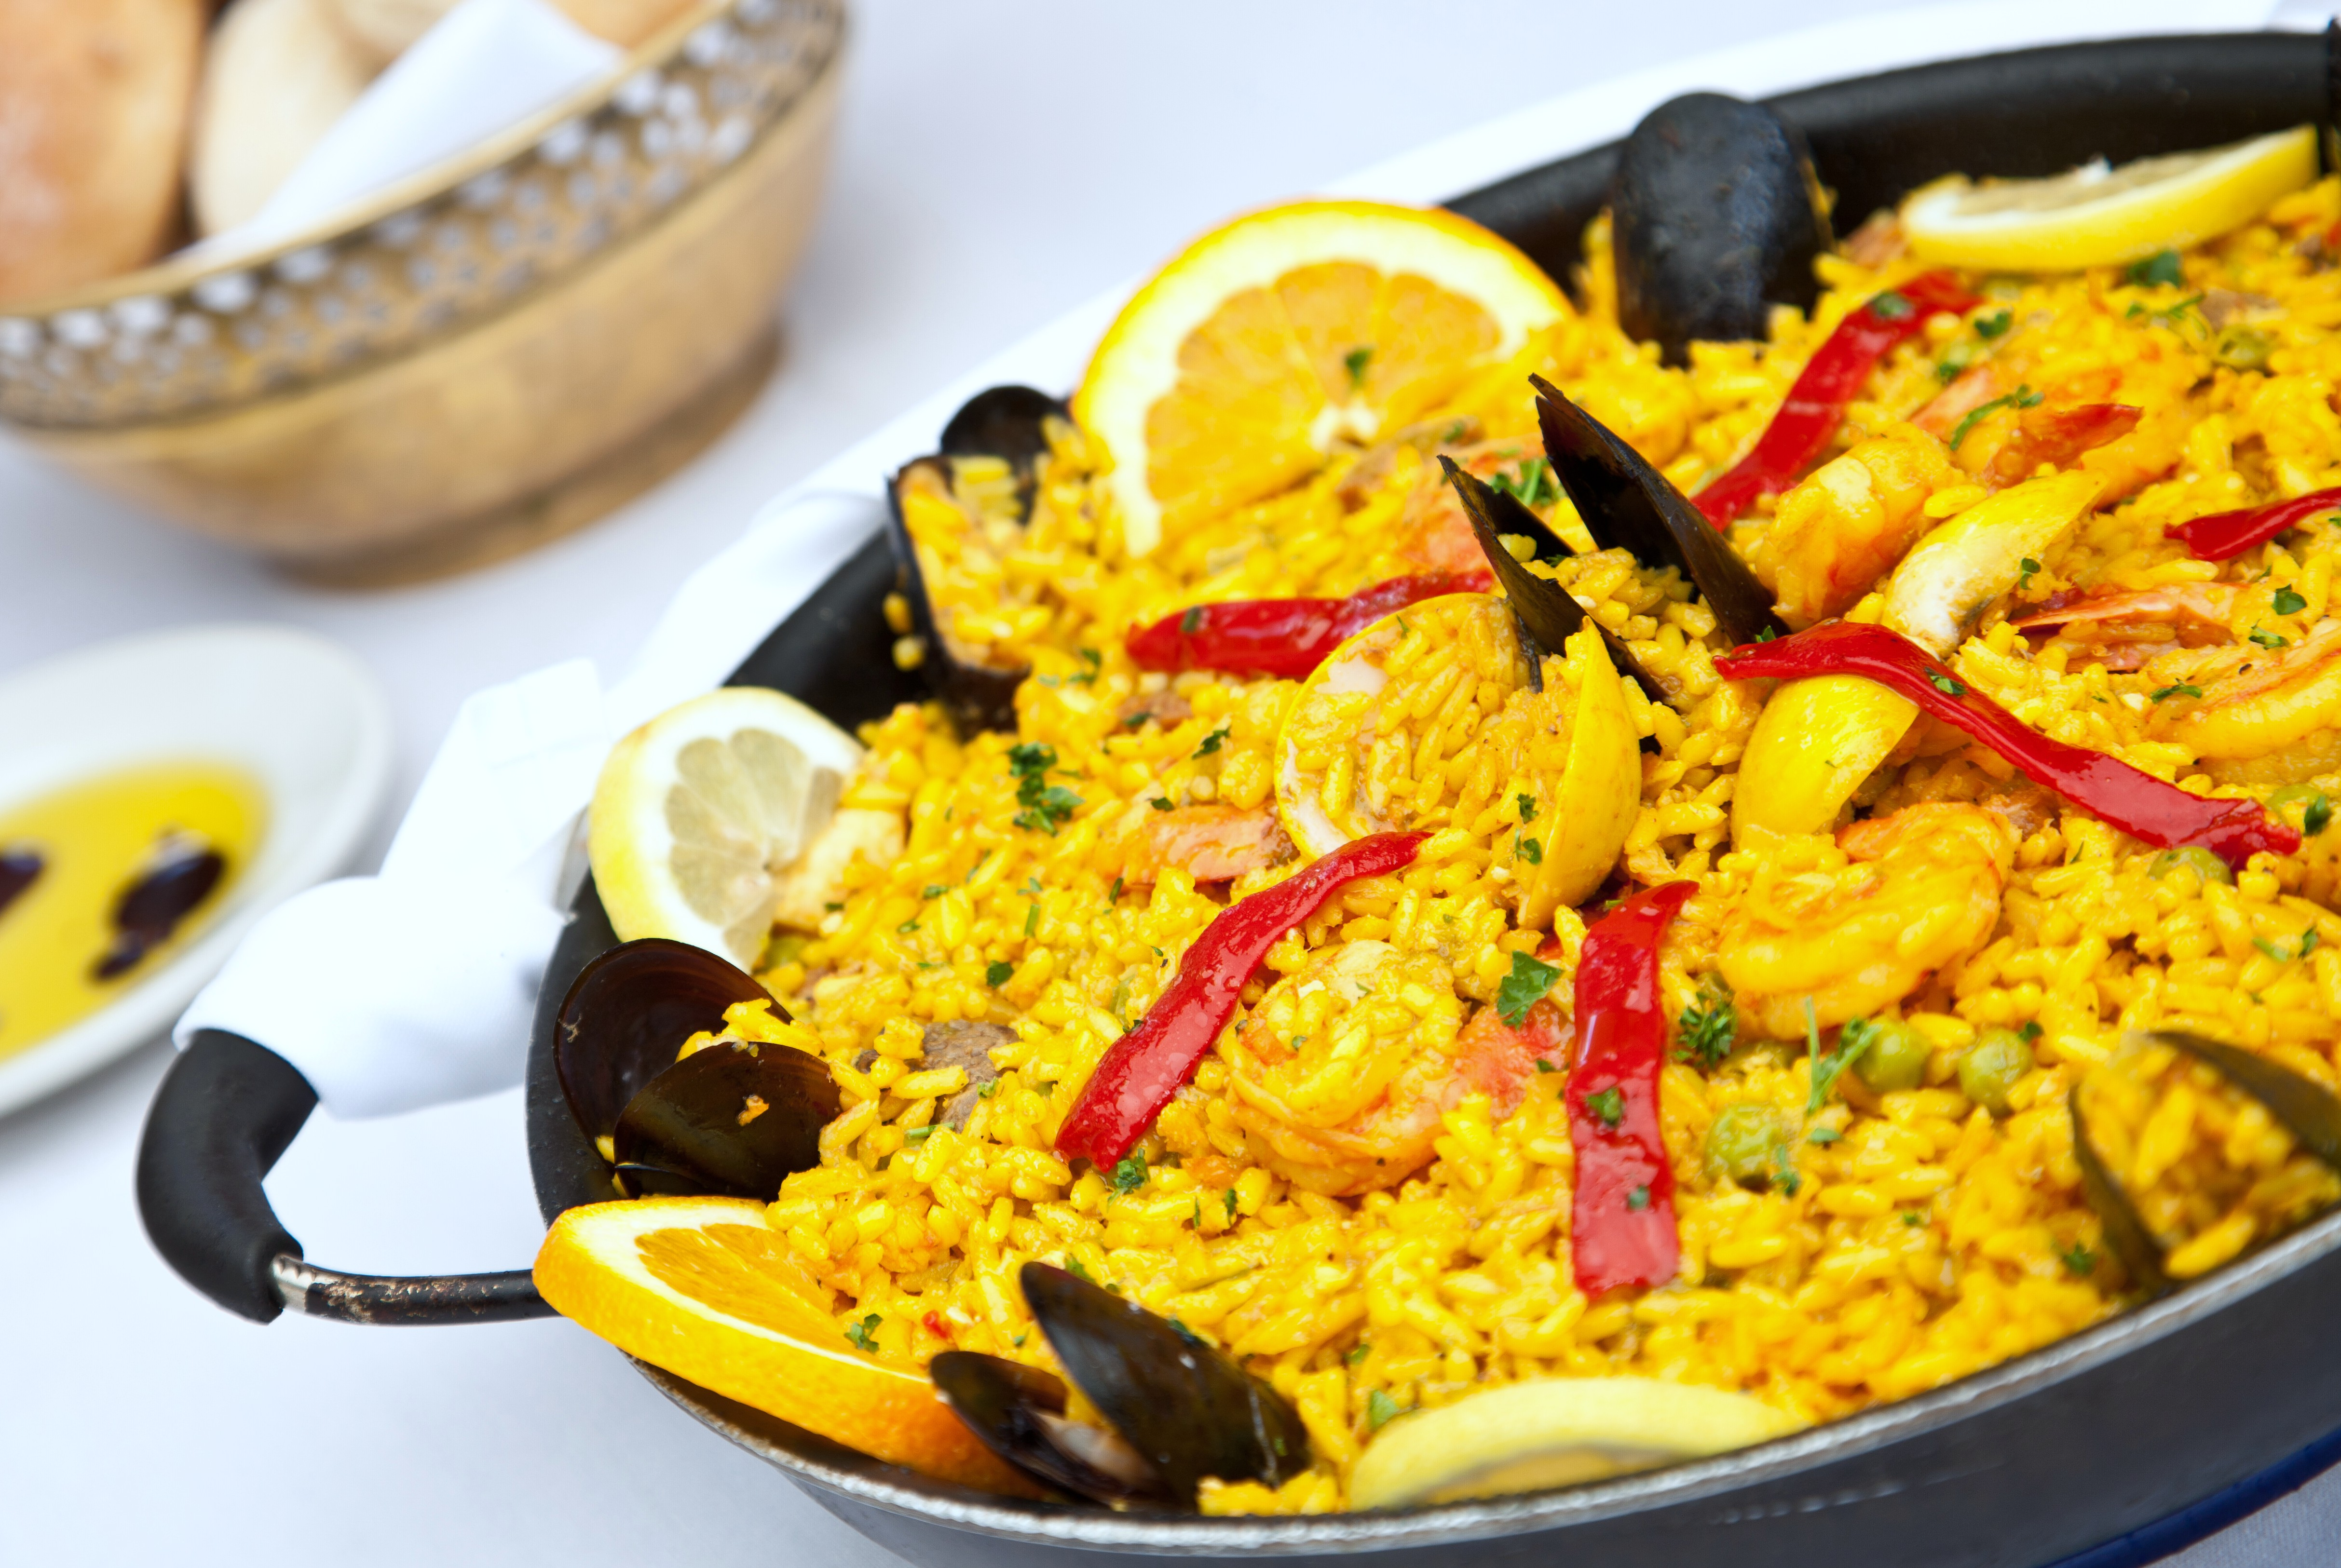 Spanish classic - Paella